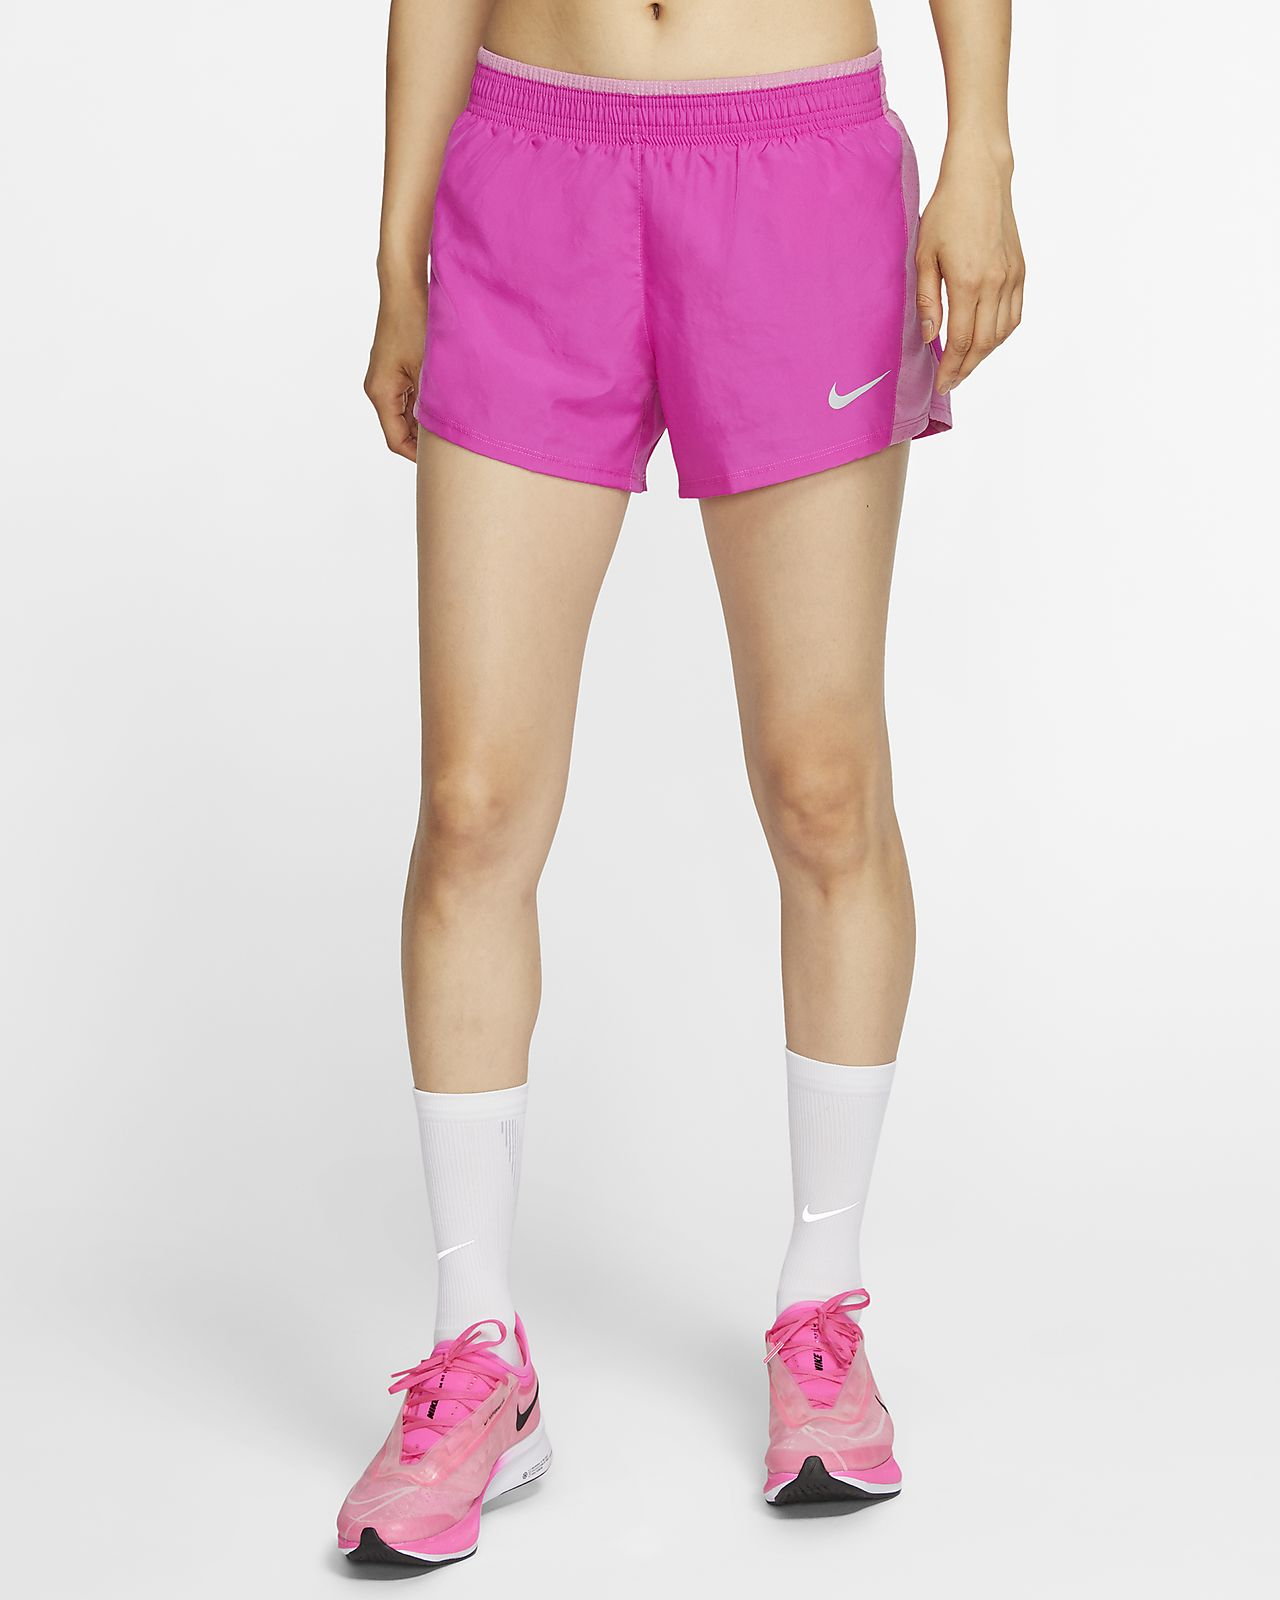 Nike 10K Damen-Laufshorts